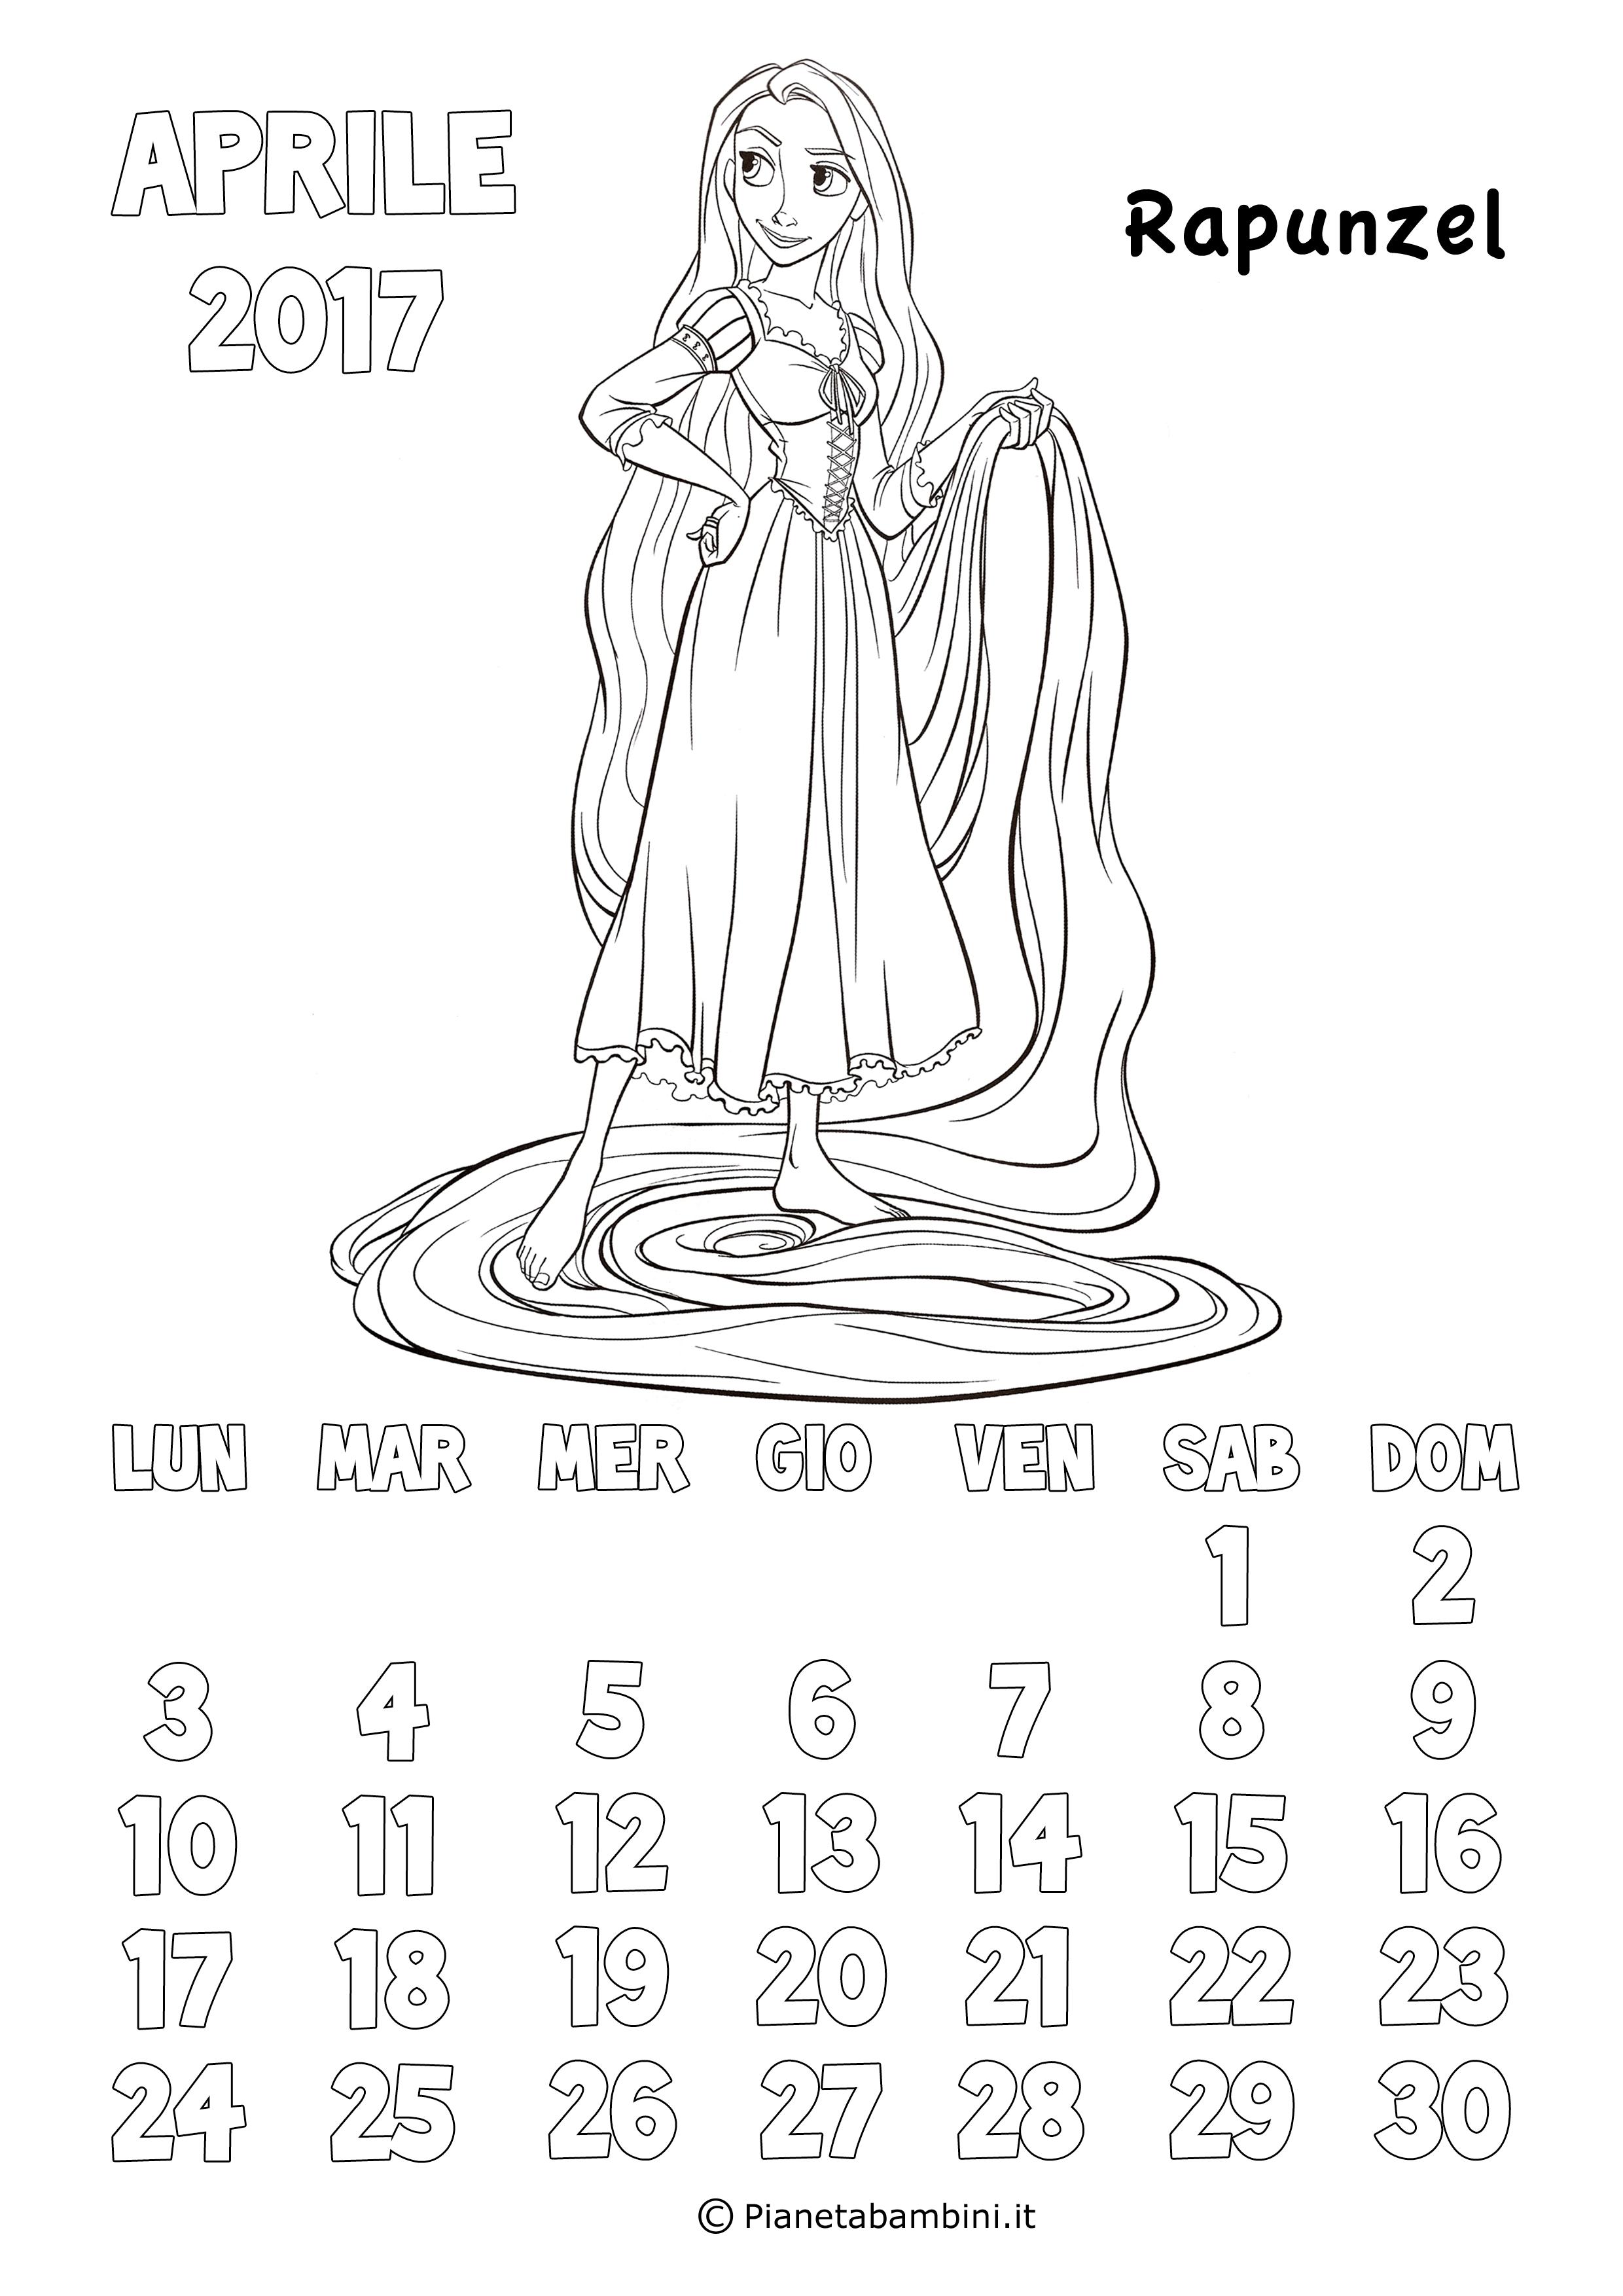 aprile-2017-rapunzel